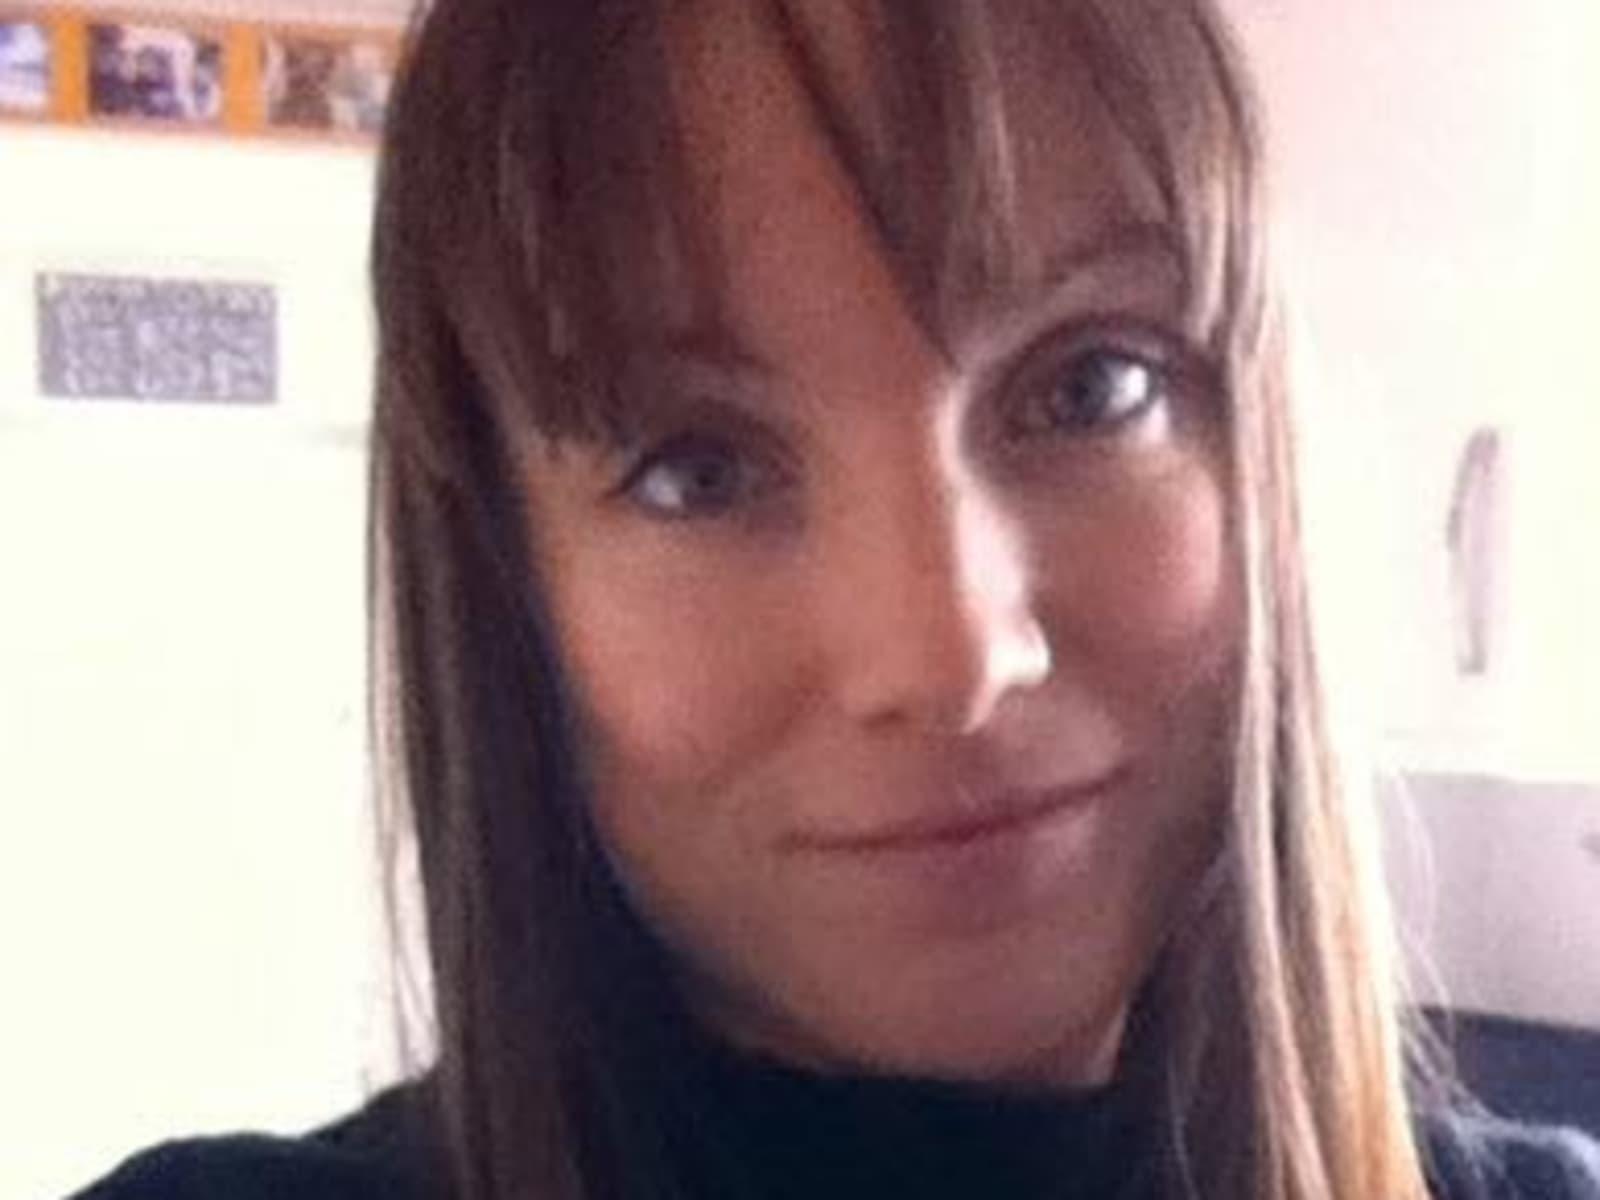 Sara from London, United Kingdom